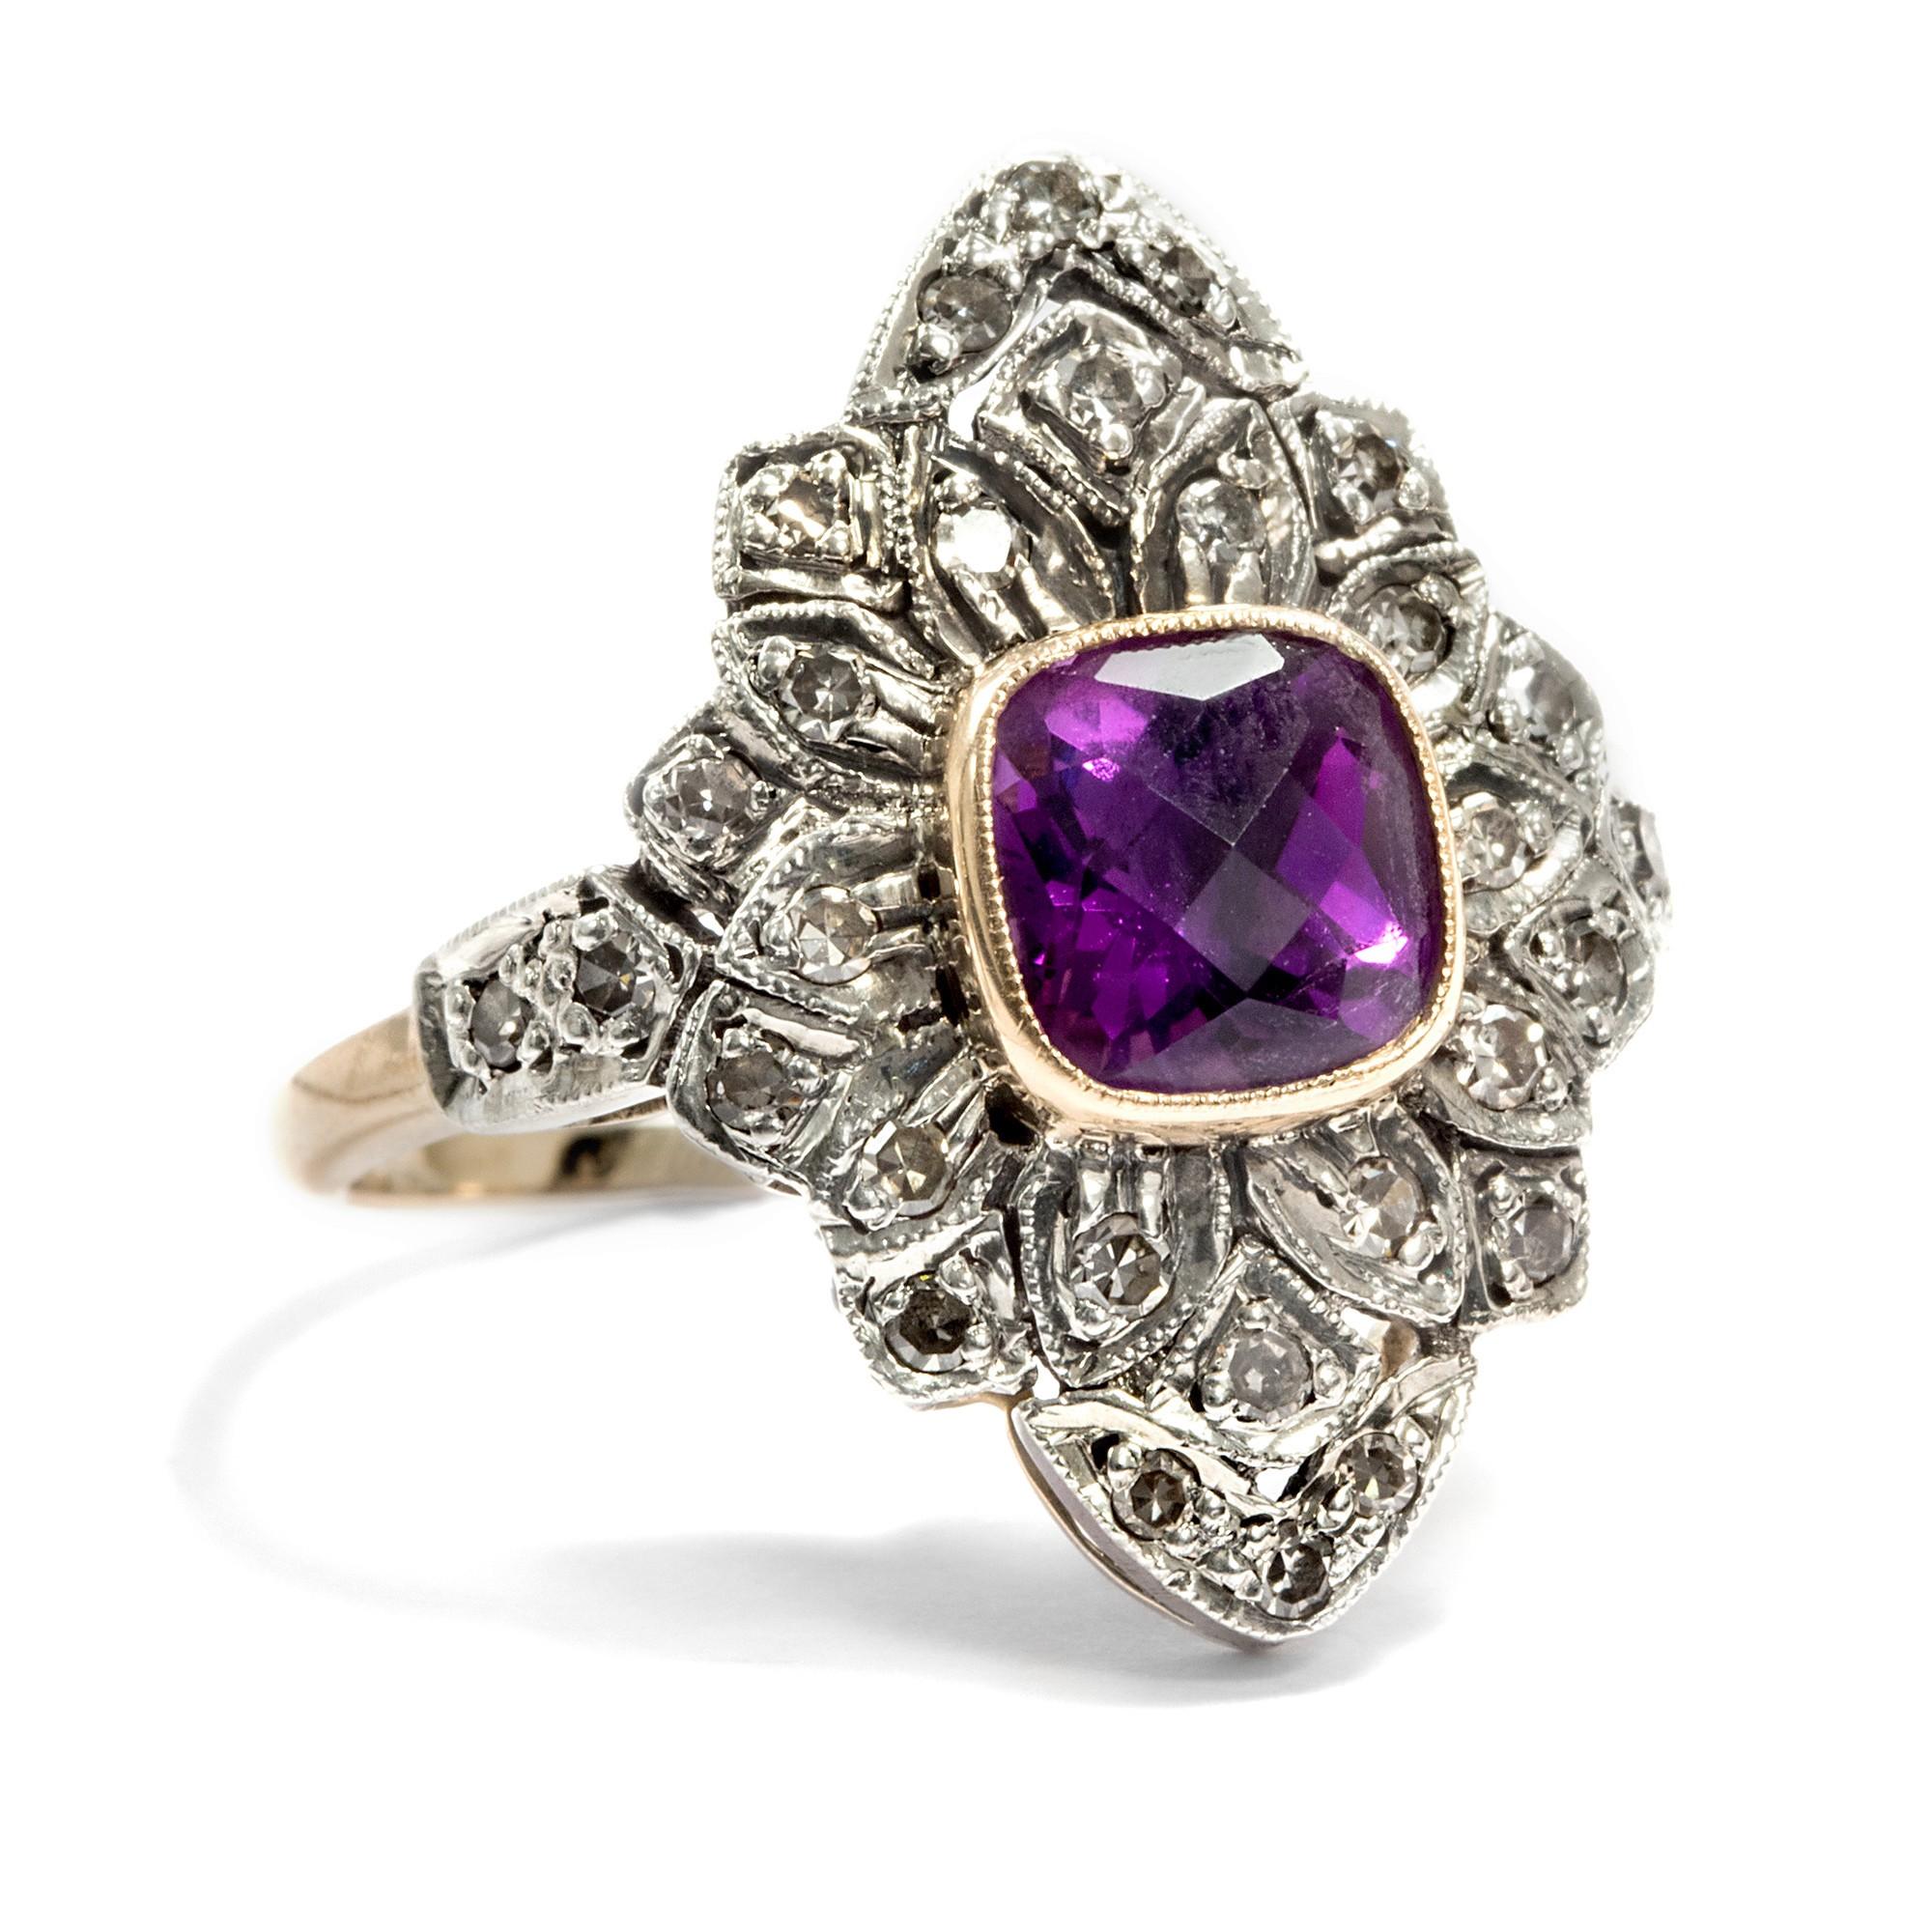 feiner amethyst diamant ring 750 gold checkerboard cut diamanten ebay. Black Bedroom Furniture Sets. Home Design Ideas